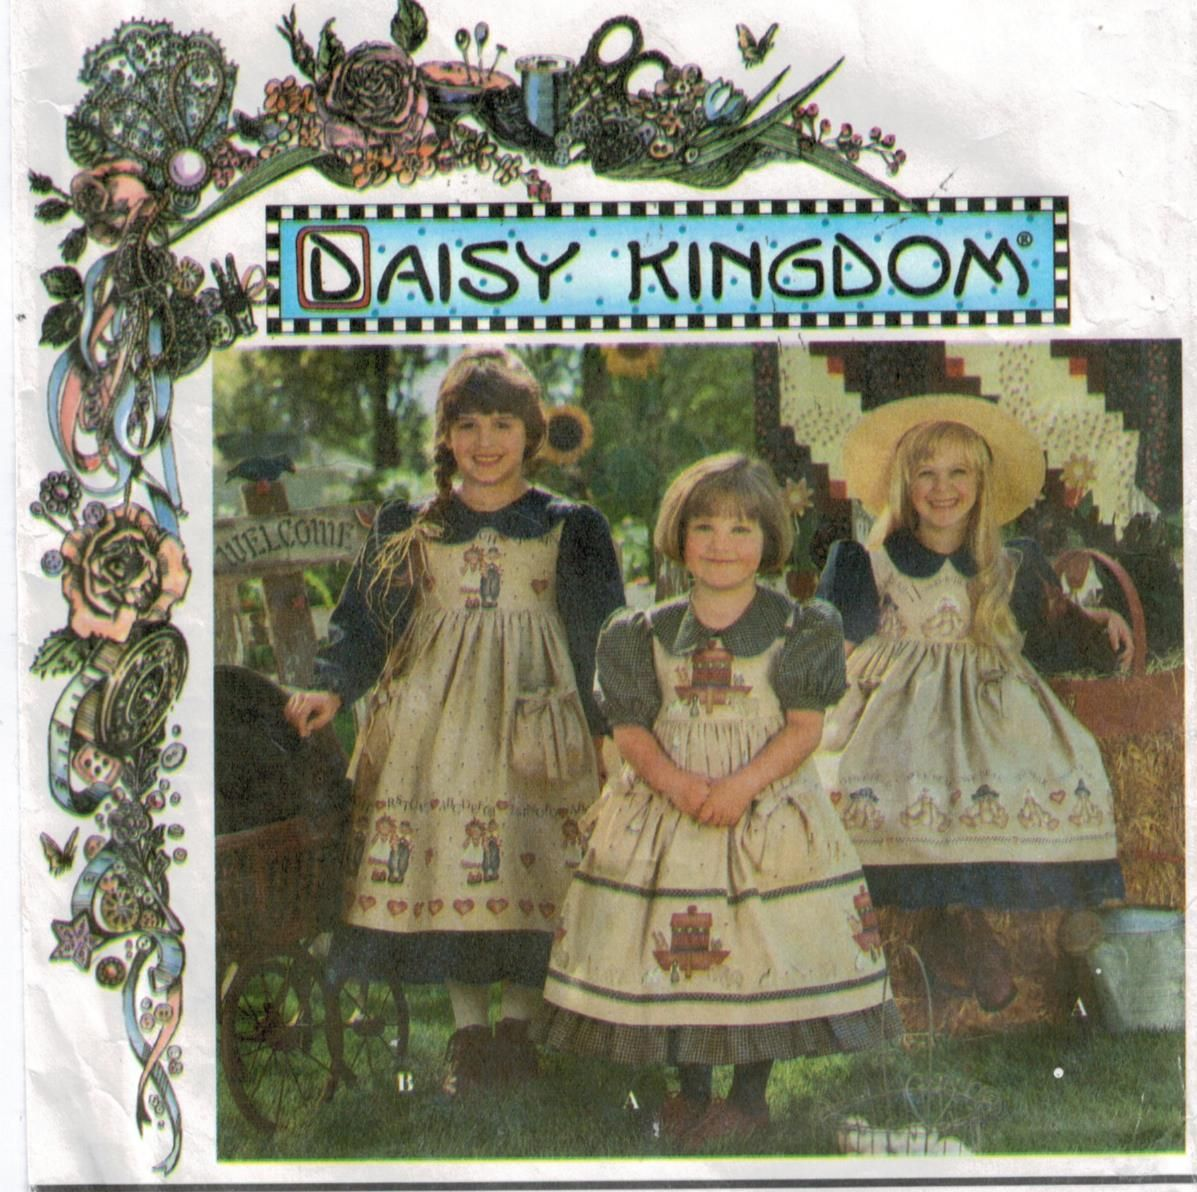 daisy kingdom dress - Google Search